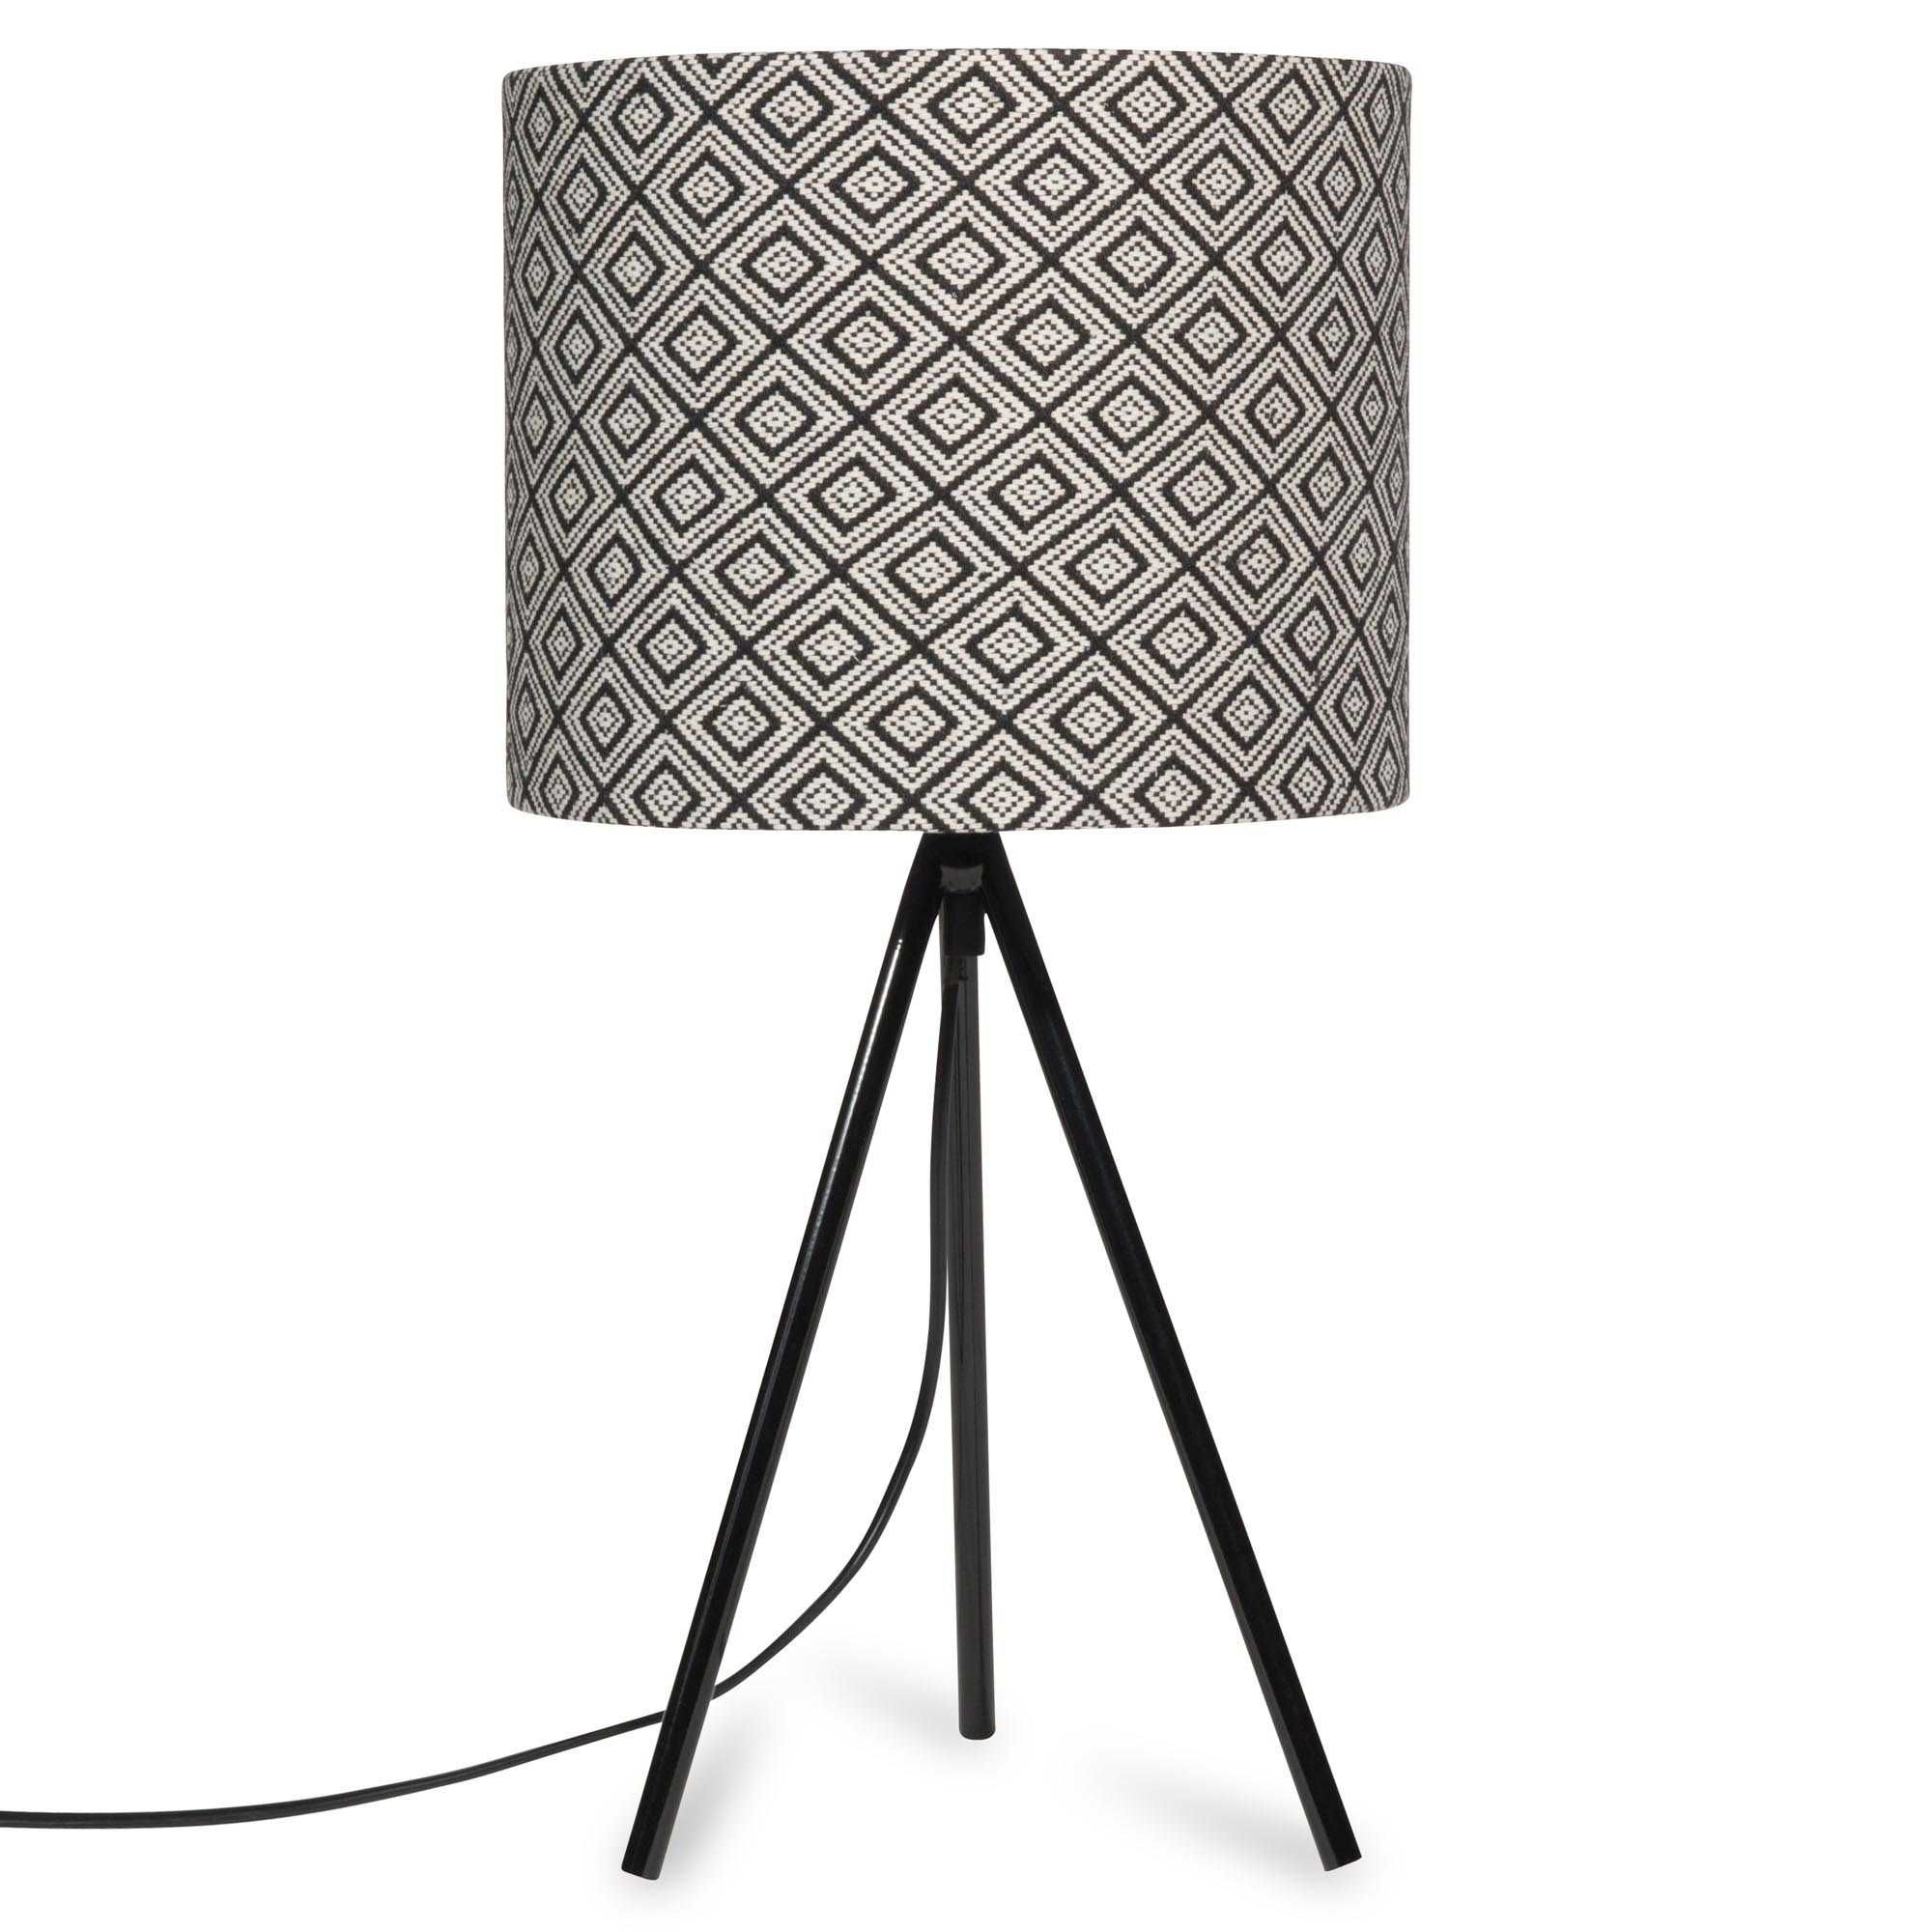 RAJA tripod lamp with black and white motifs